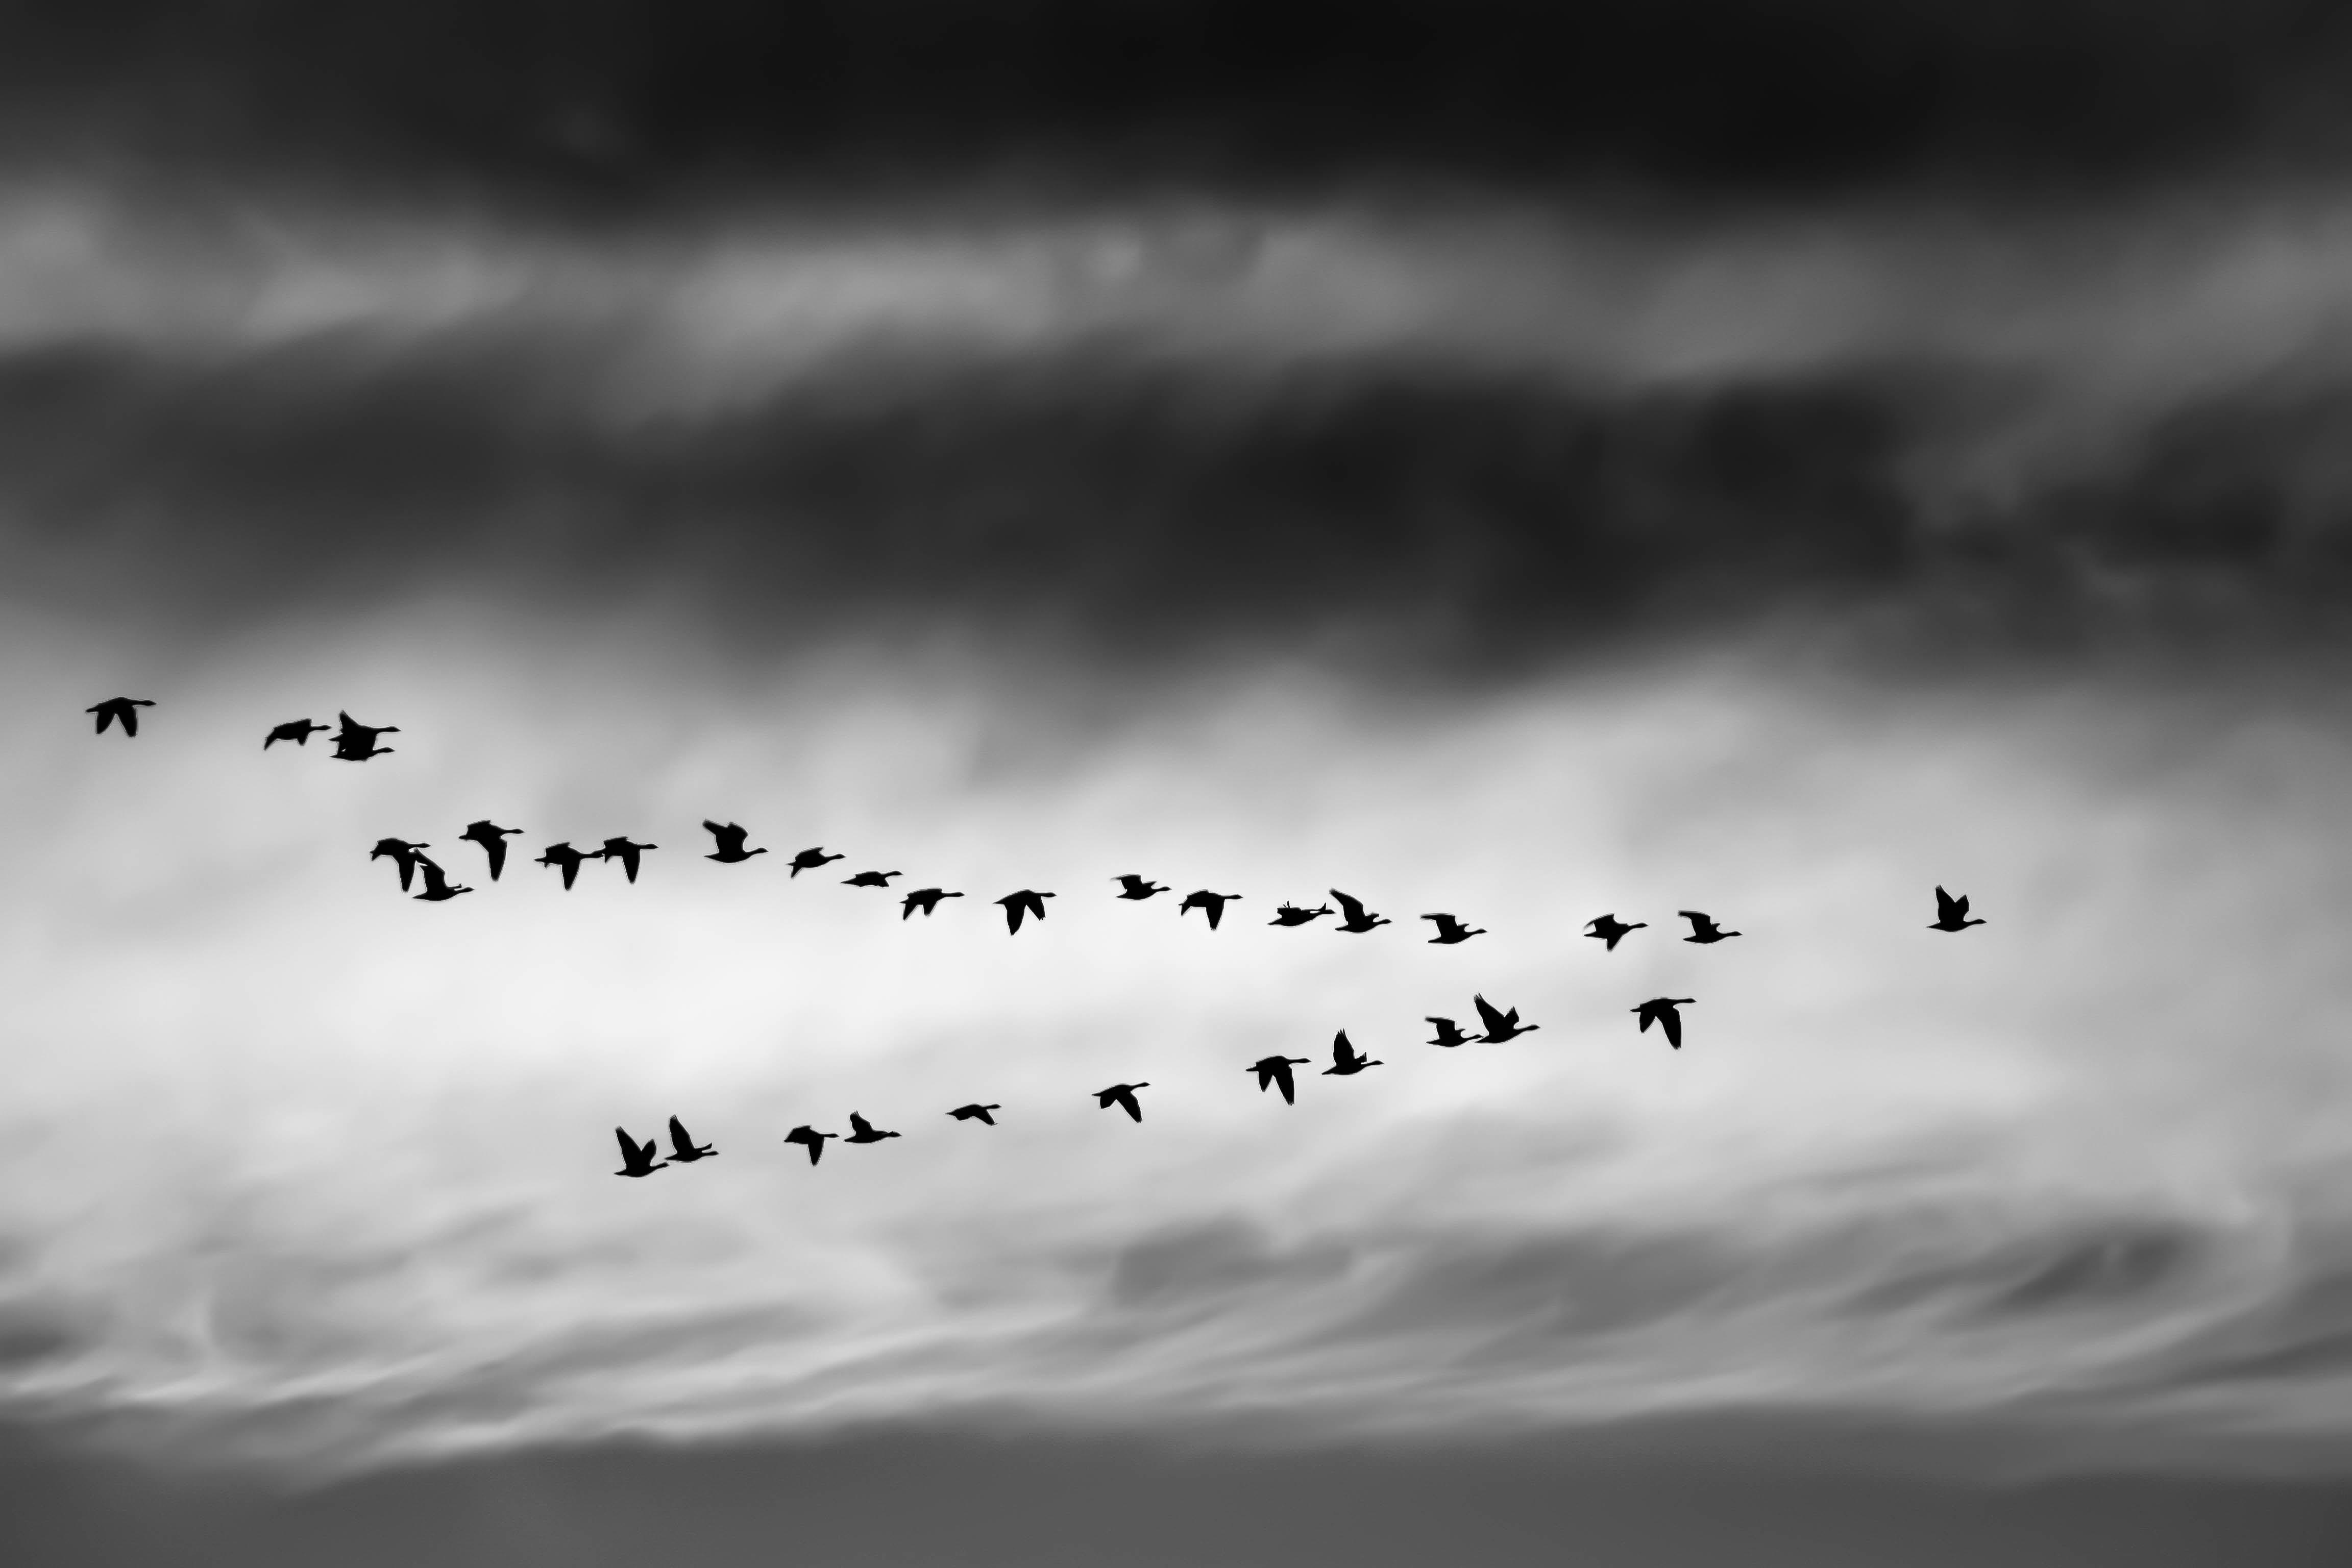 flock of birds flying on dark clouds